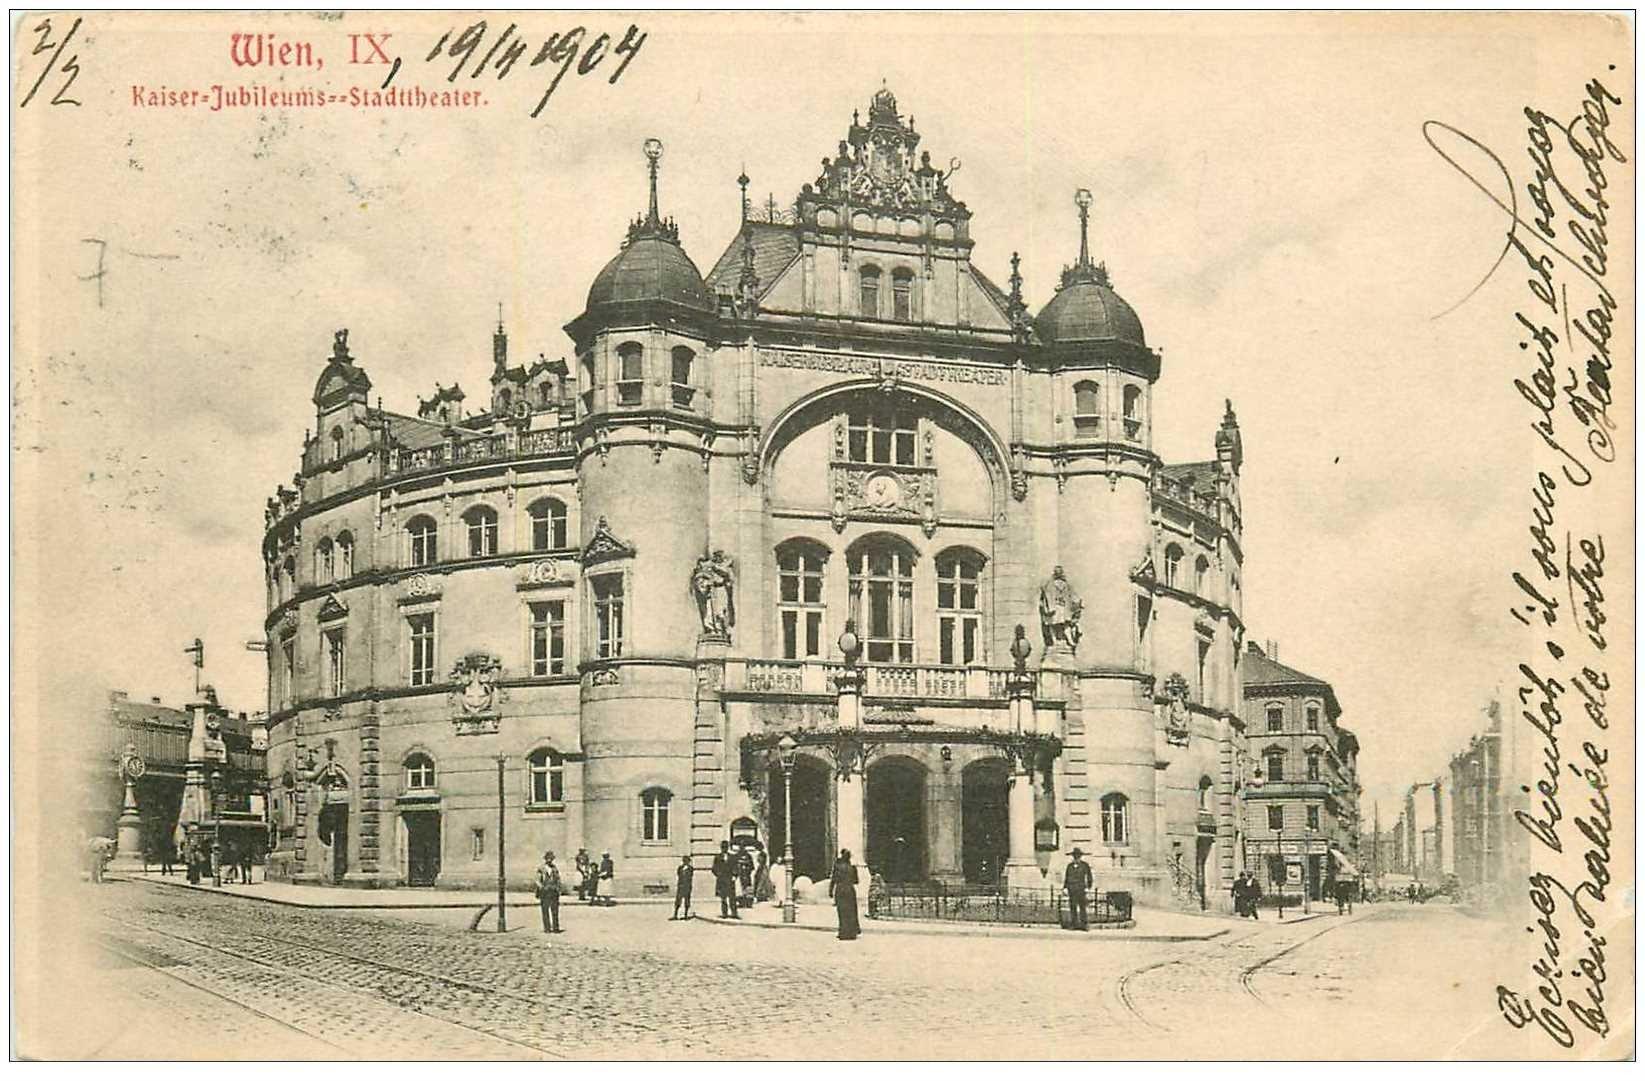 carte postale ancienne WIEN VIENNE. Kaiser Jubileums Stadtheater 1904